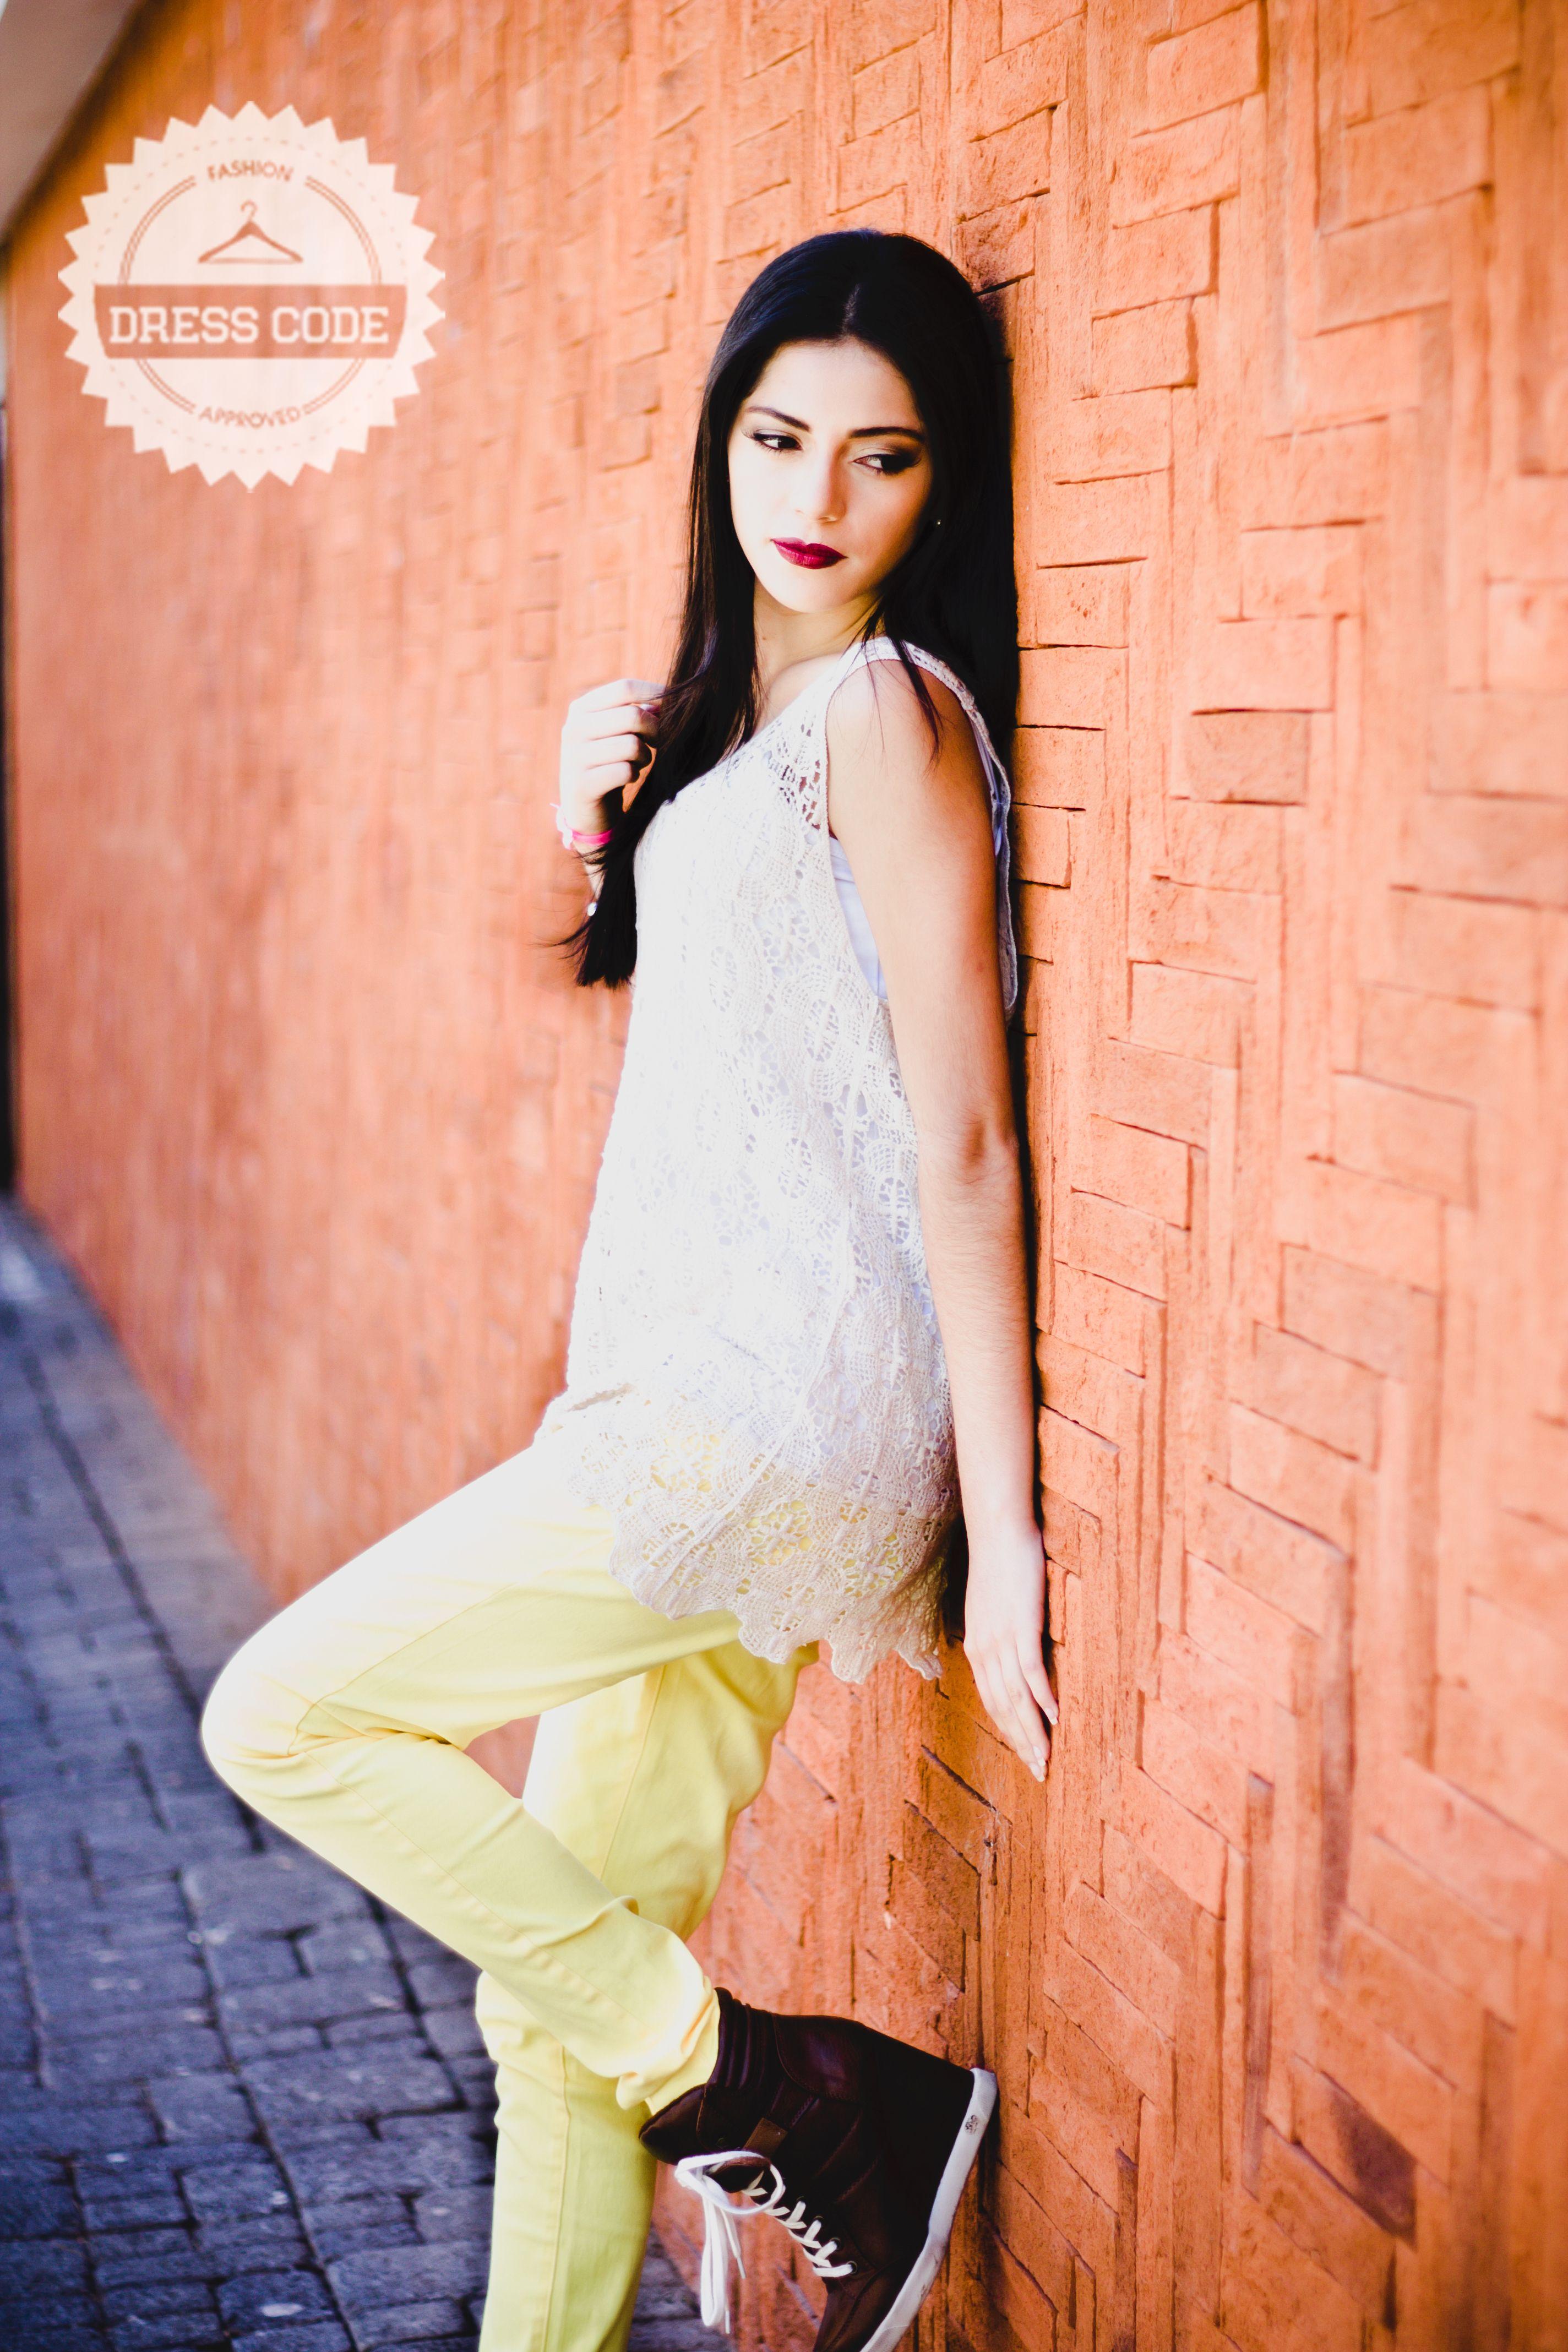 Yellow Skinny + Blusa de Guipur! Pedidos por medio de inbox o al 47620153 o 42120798! Emoticono smile Emoticono grin Photo by Wongraphy - Make up Make-up Designory Guatemala - Modelo Isa Estrada!! #ilovedresscodeguate #dresscodeguate #moda #fashion #ootd